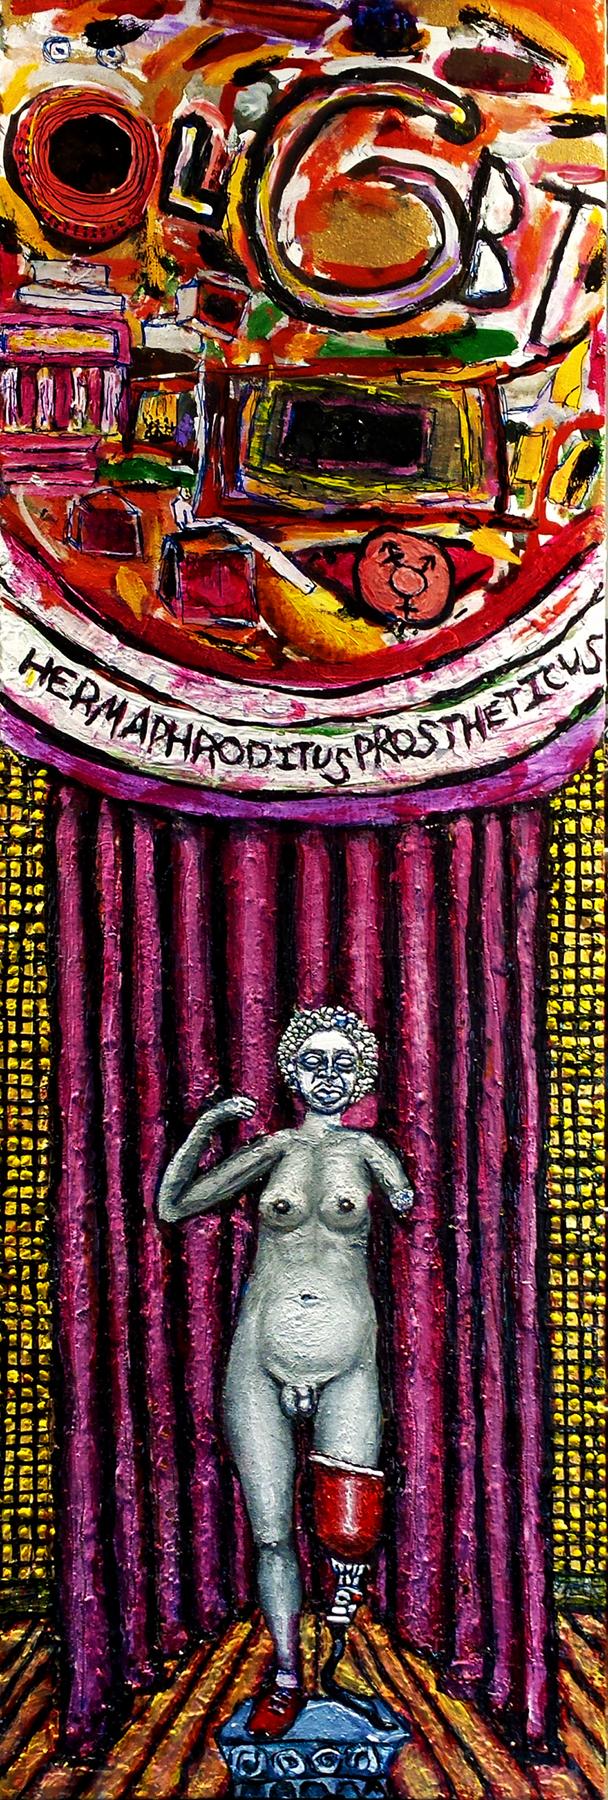 Hermaphroditus Prostheticus 300 dpi 1800